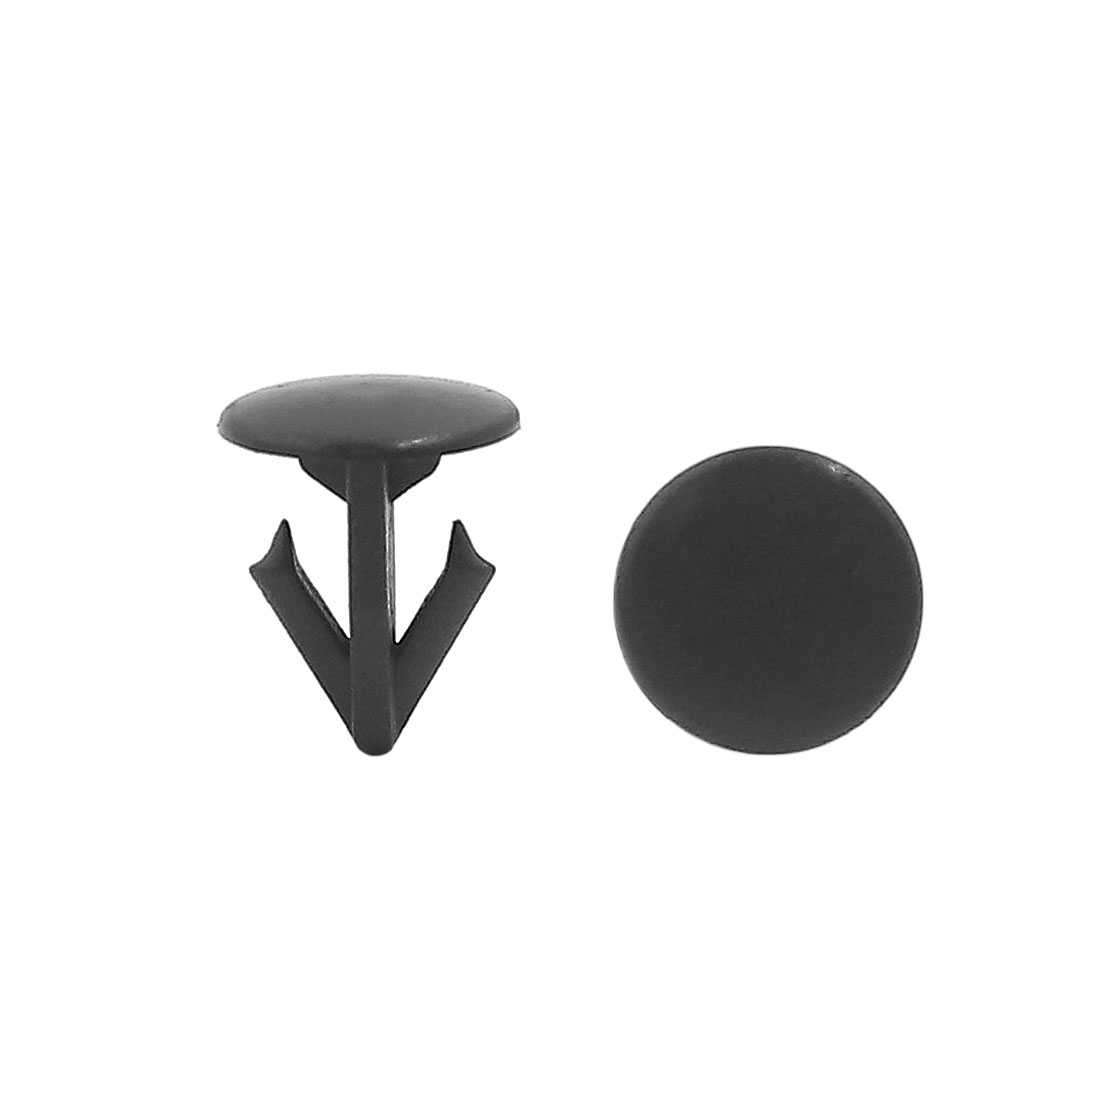 100Pcs Black Car Plastic Door Fender Clips 7.5mm Hole Dia  Rivets Fastener - image 2 of 2